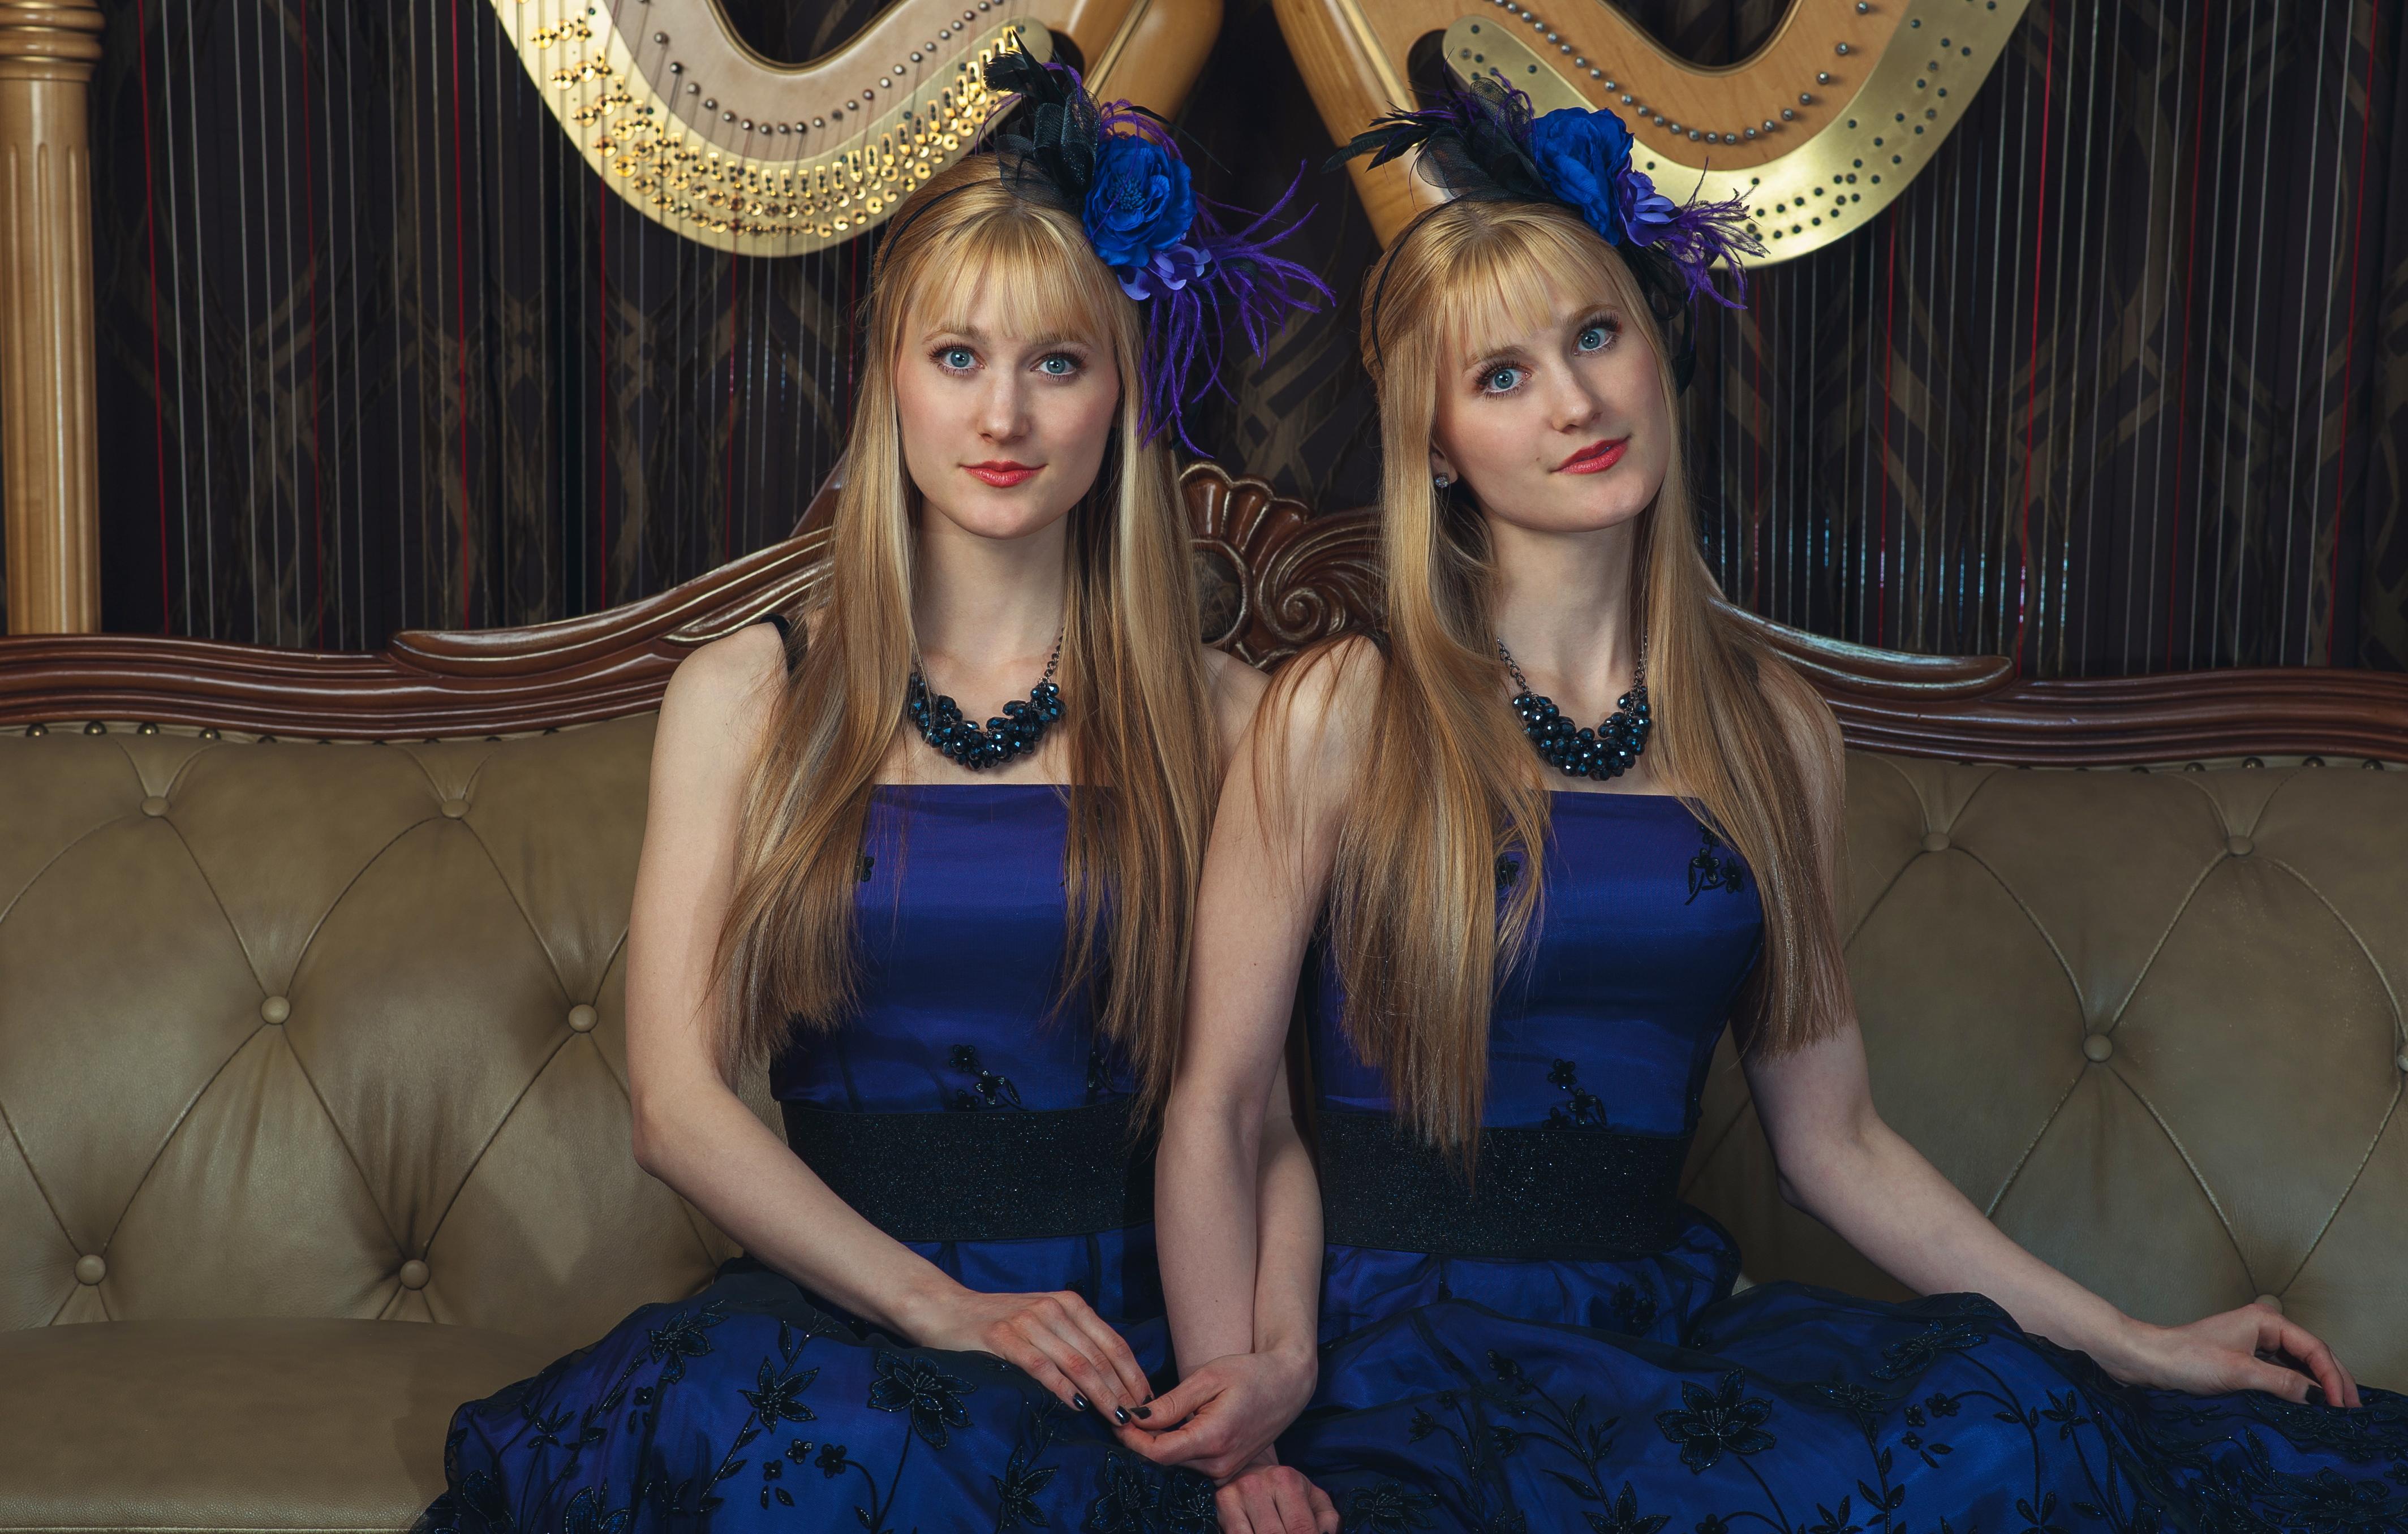 Harp_Twins_promo_3